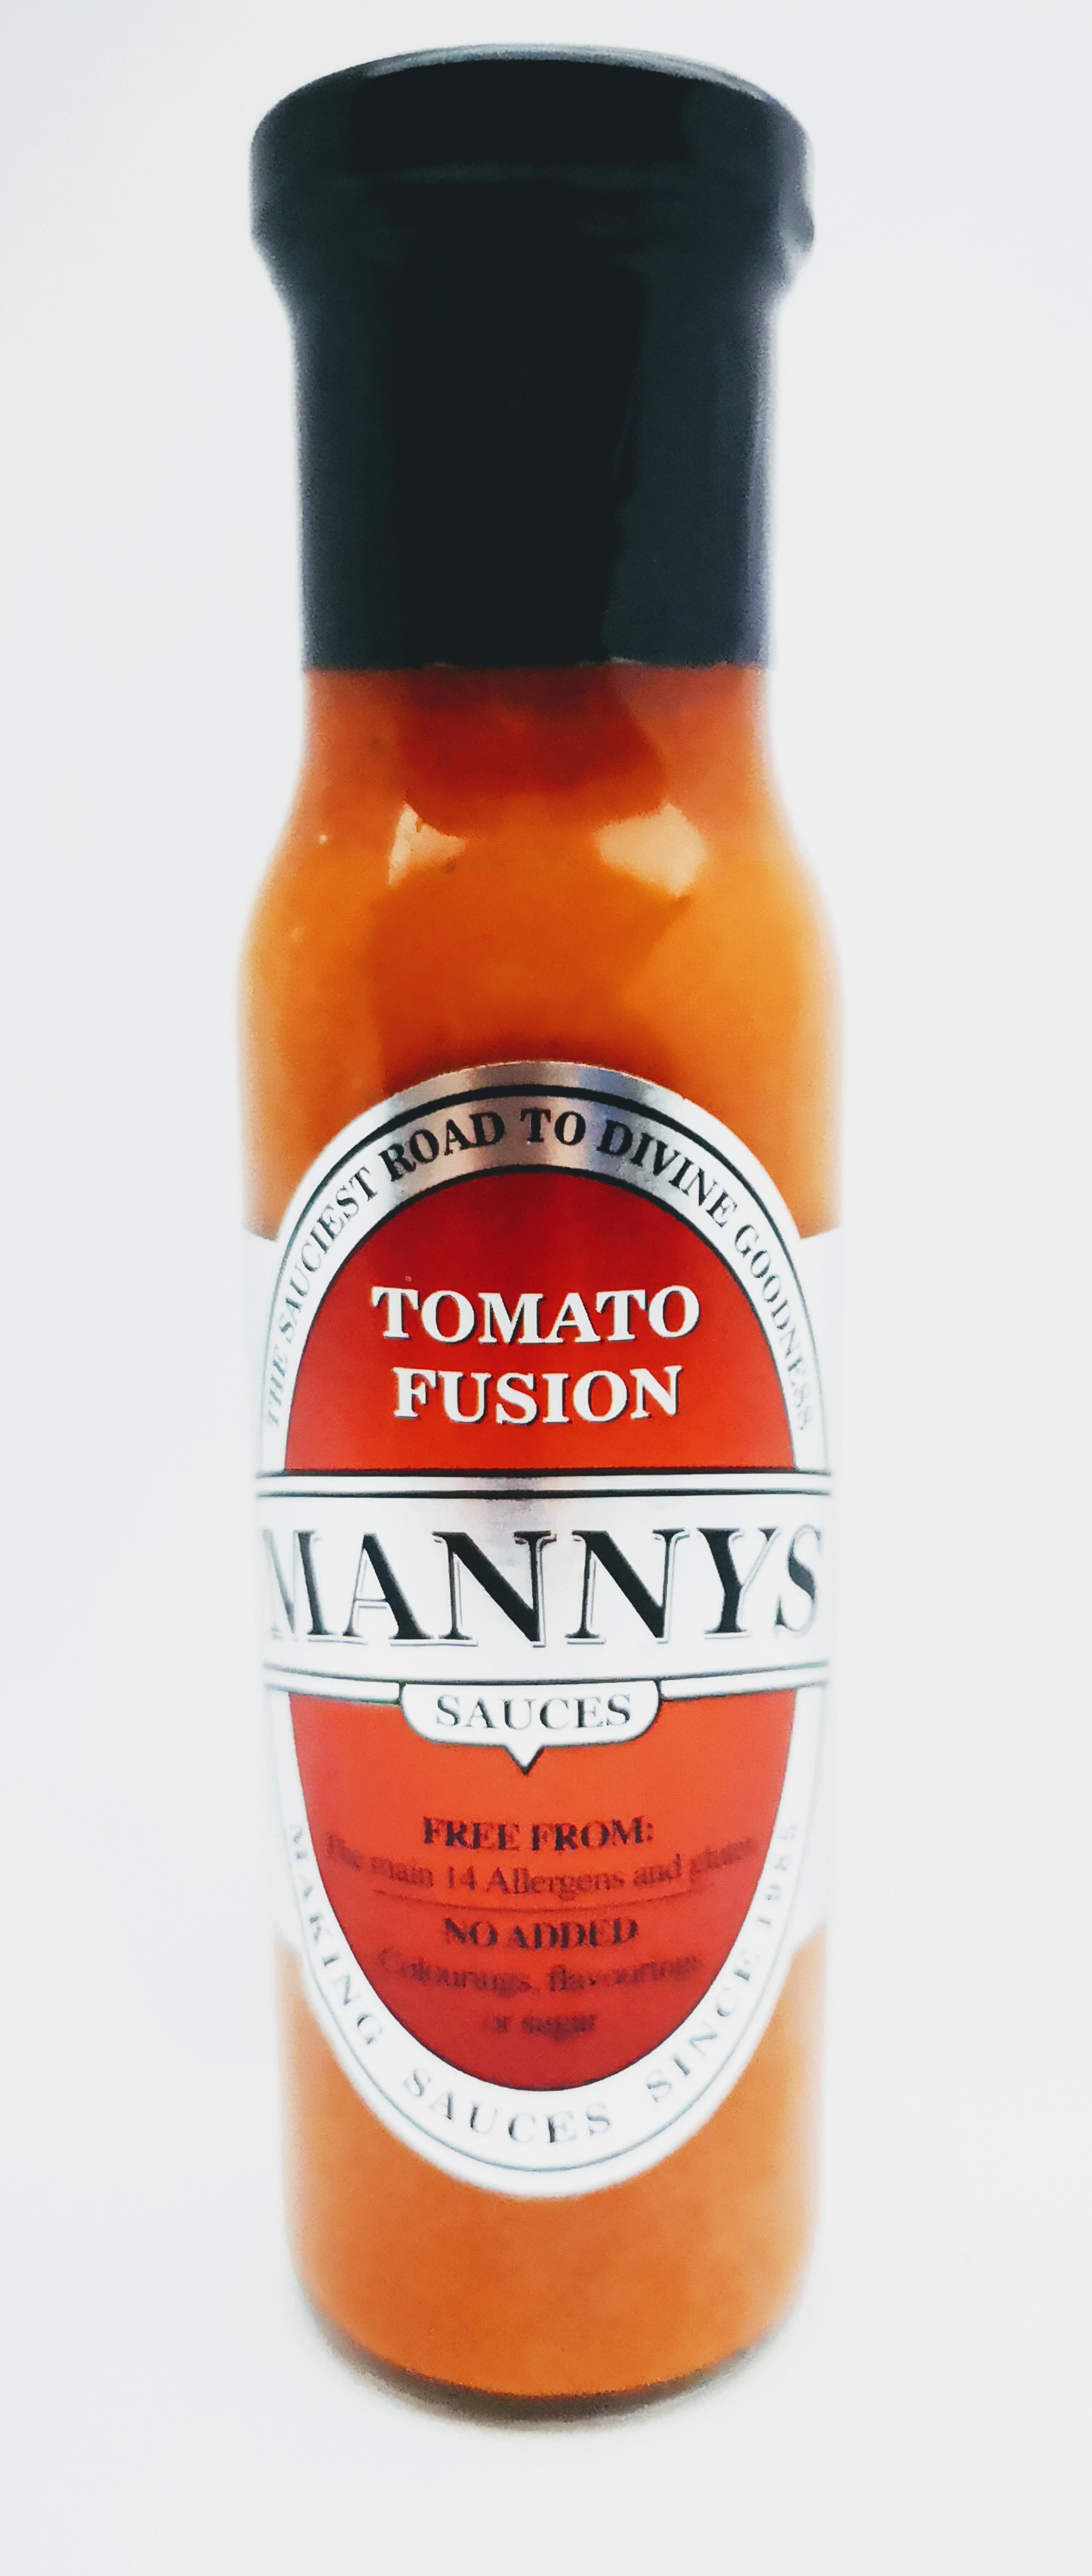 Tomato Fusion